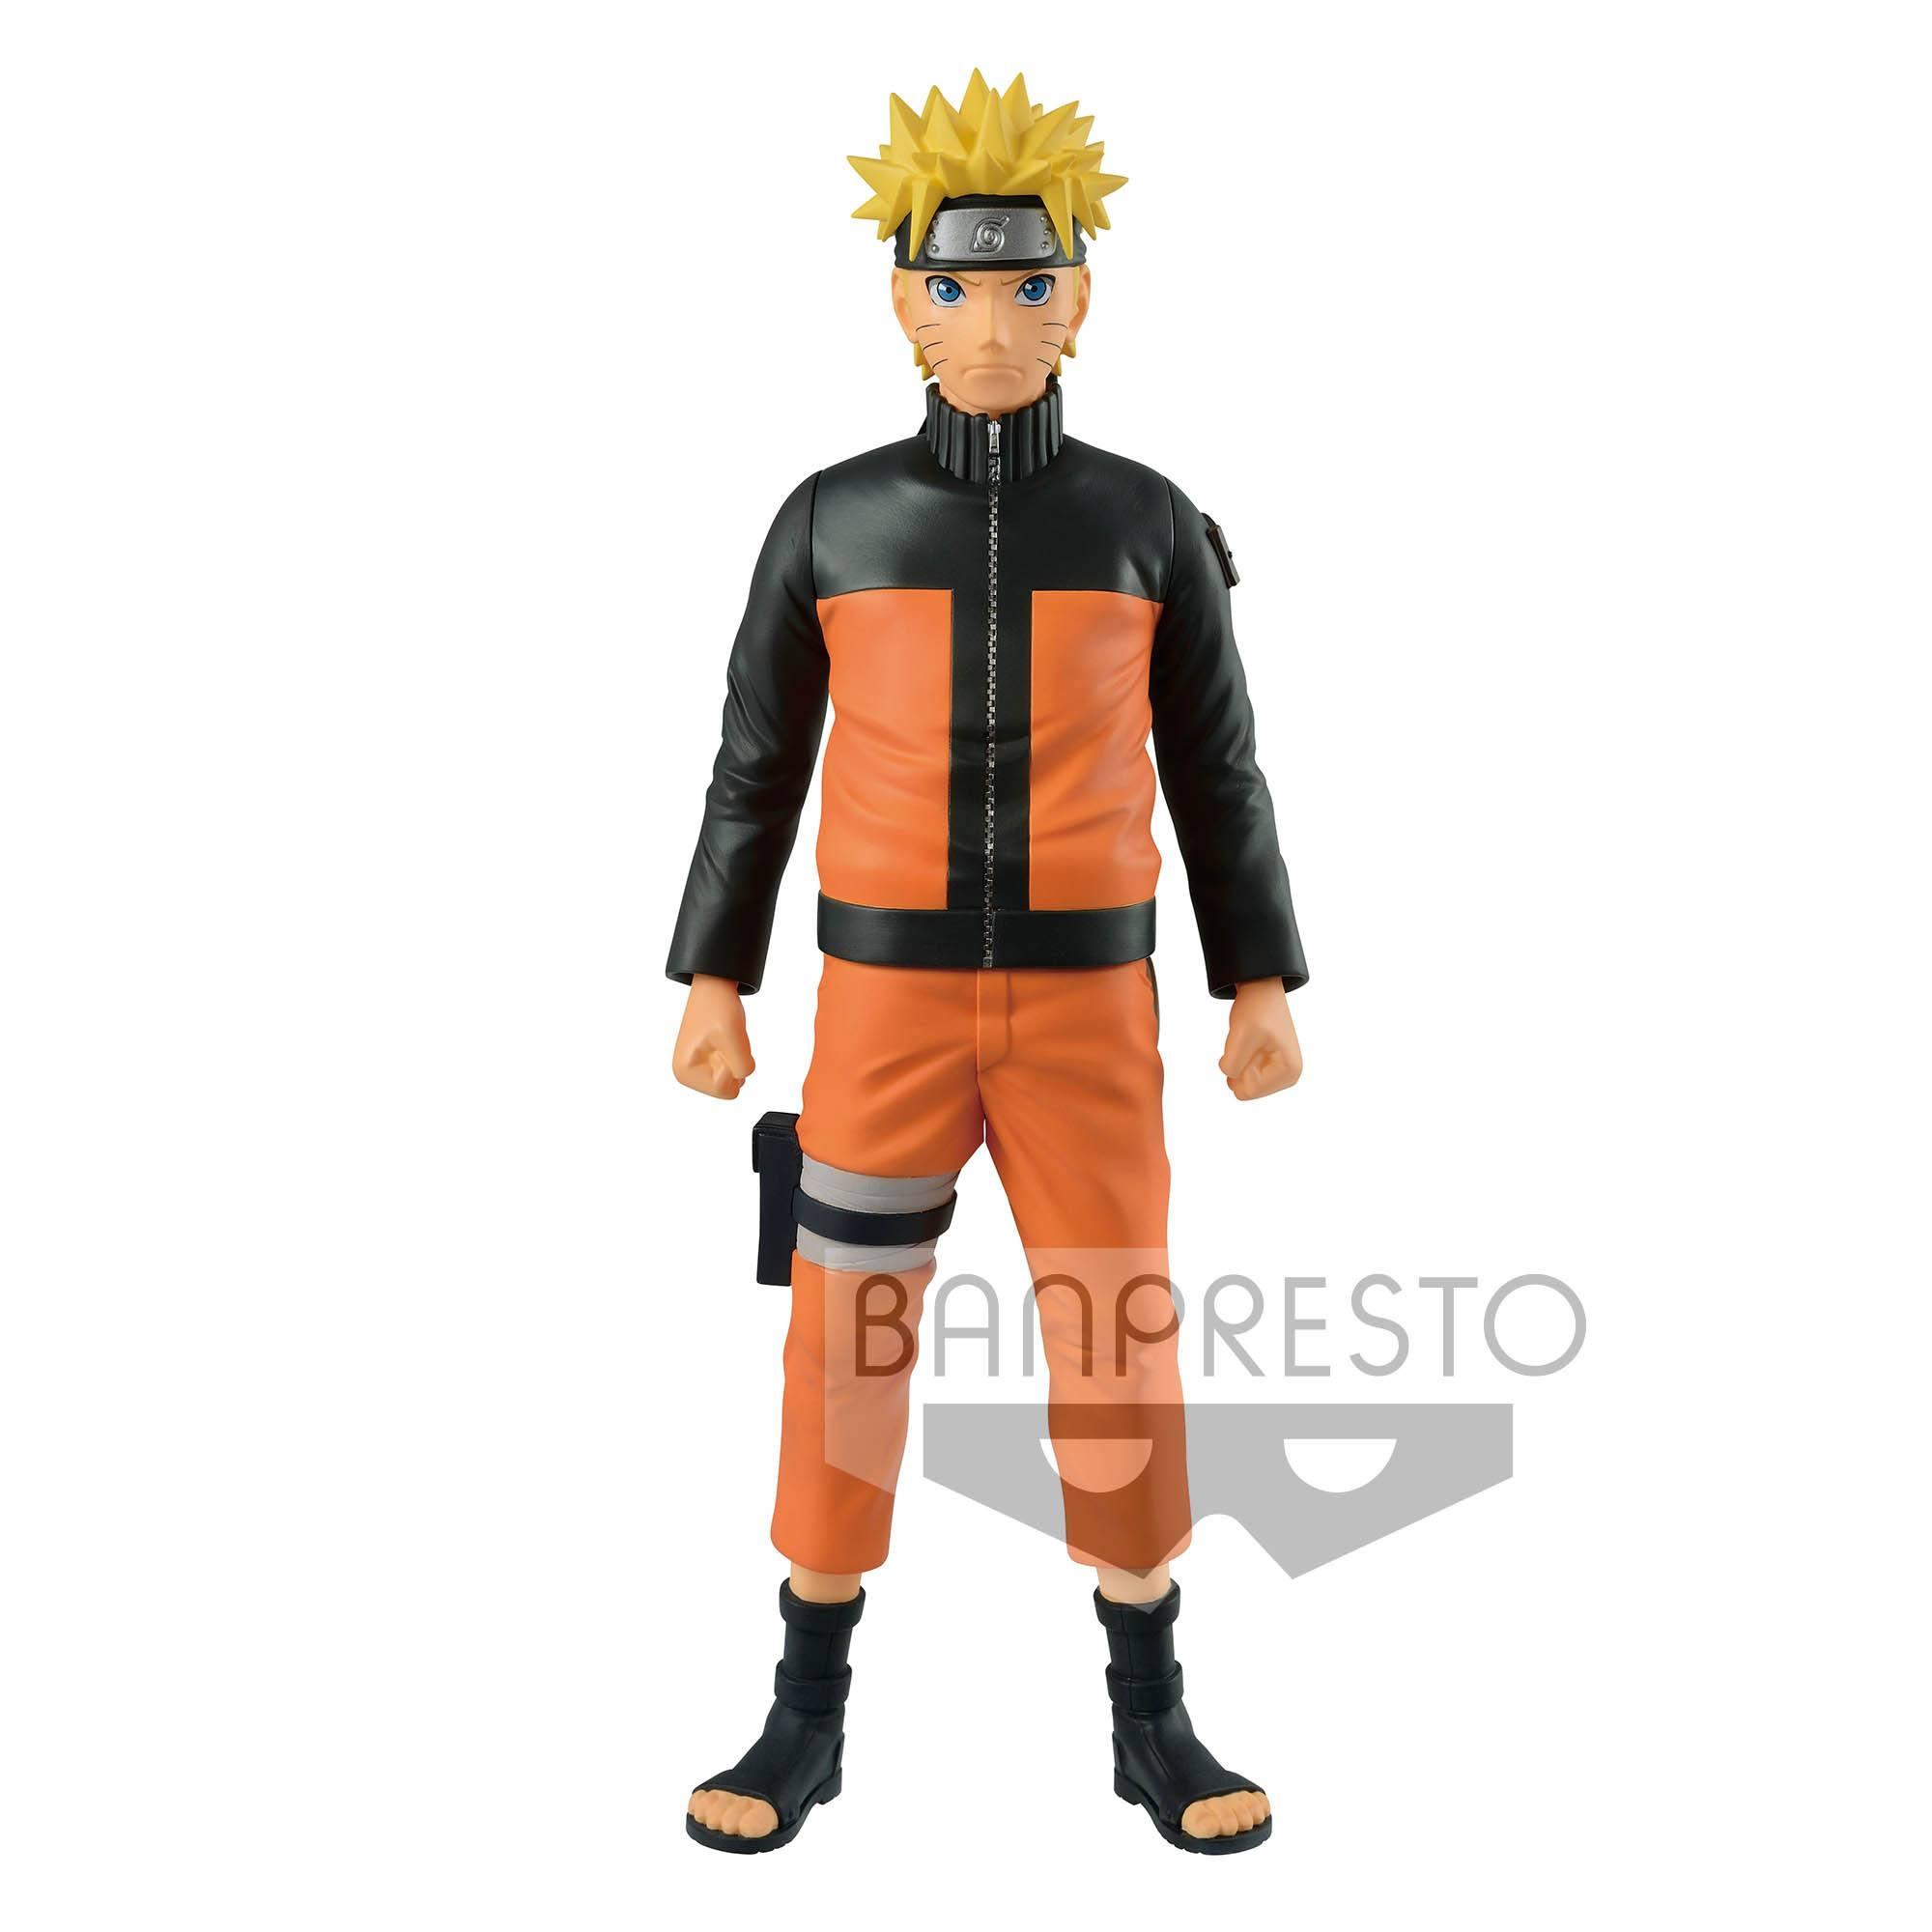 Naruto Shippuden Big Size Vinyl Figure Naruto 27 cm  Animegami Store